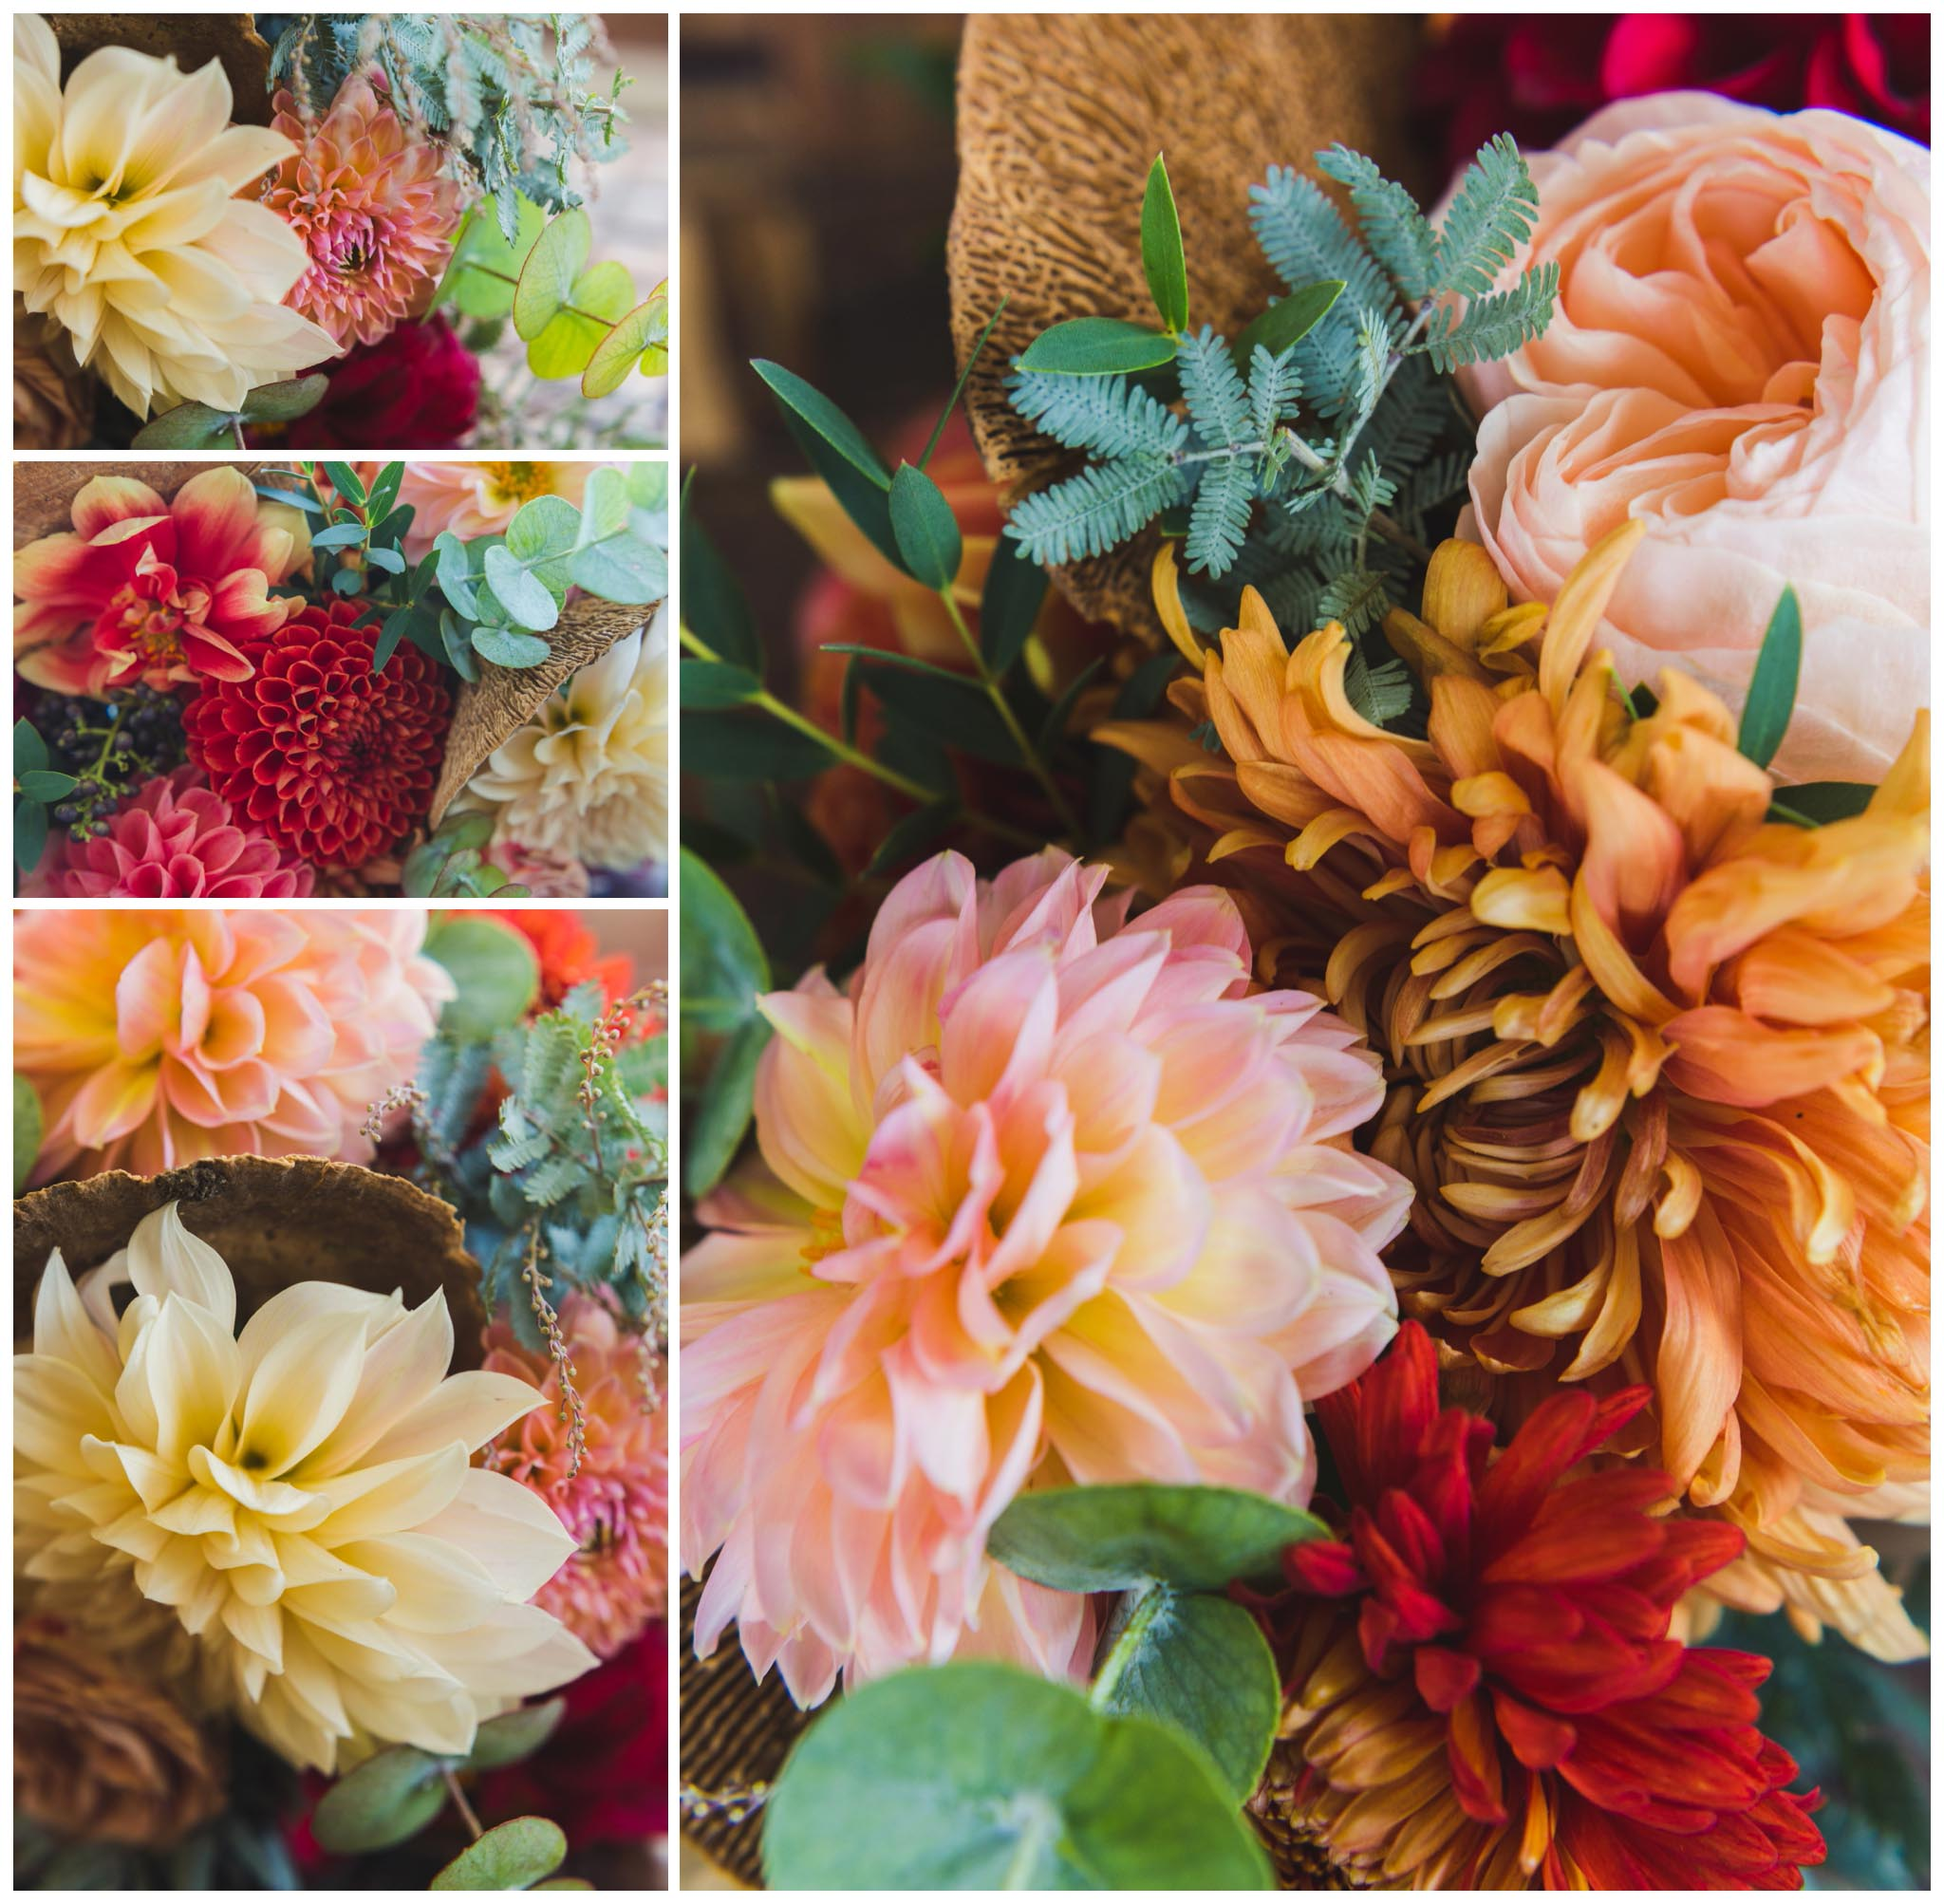 Falls Flowers, bouquet